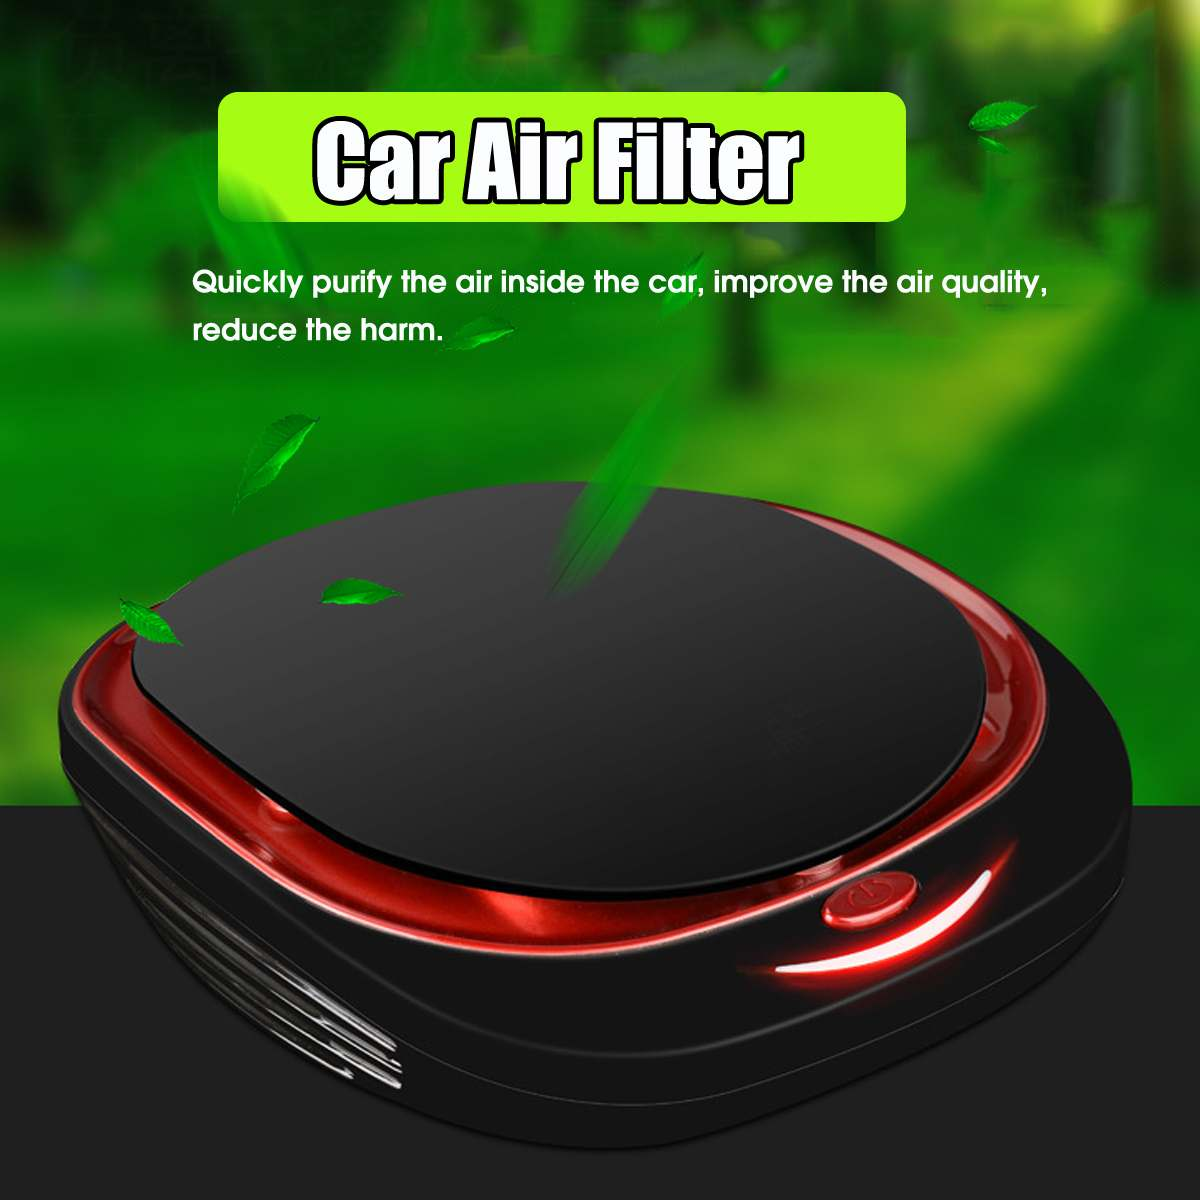 Audew Mini Car Air Purifier 12V Negative Ions Air Cleaner Ionizer Air Freshener Auto Mist Maker Eliminator Low Noise